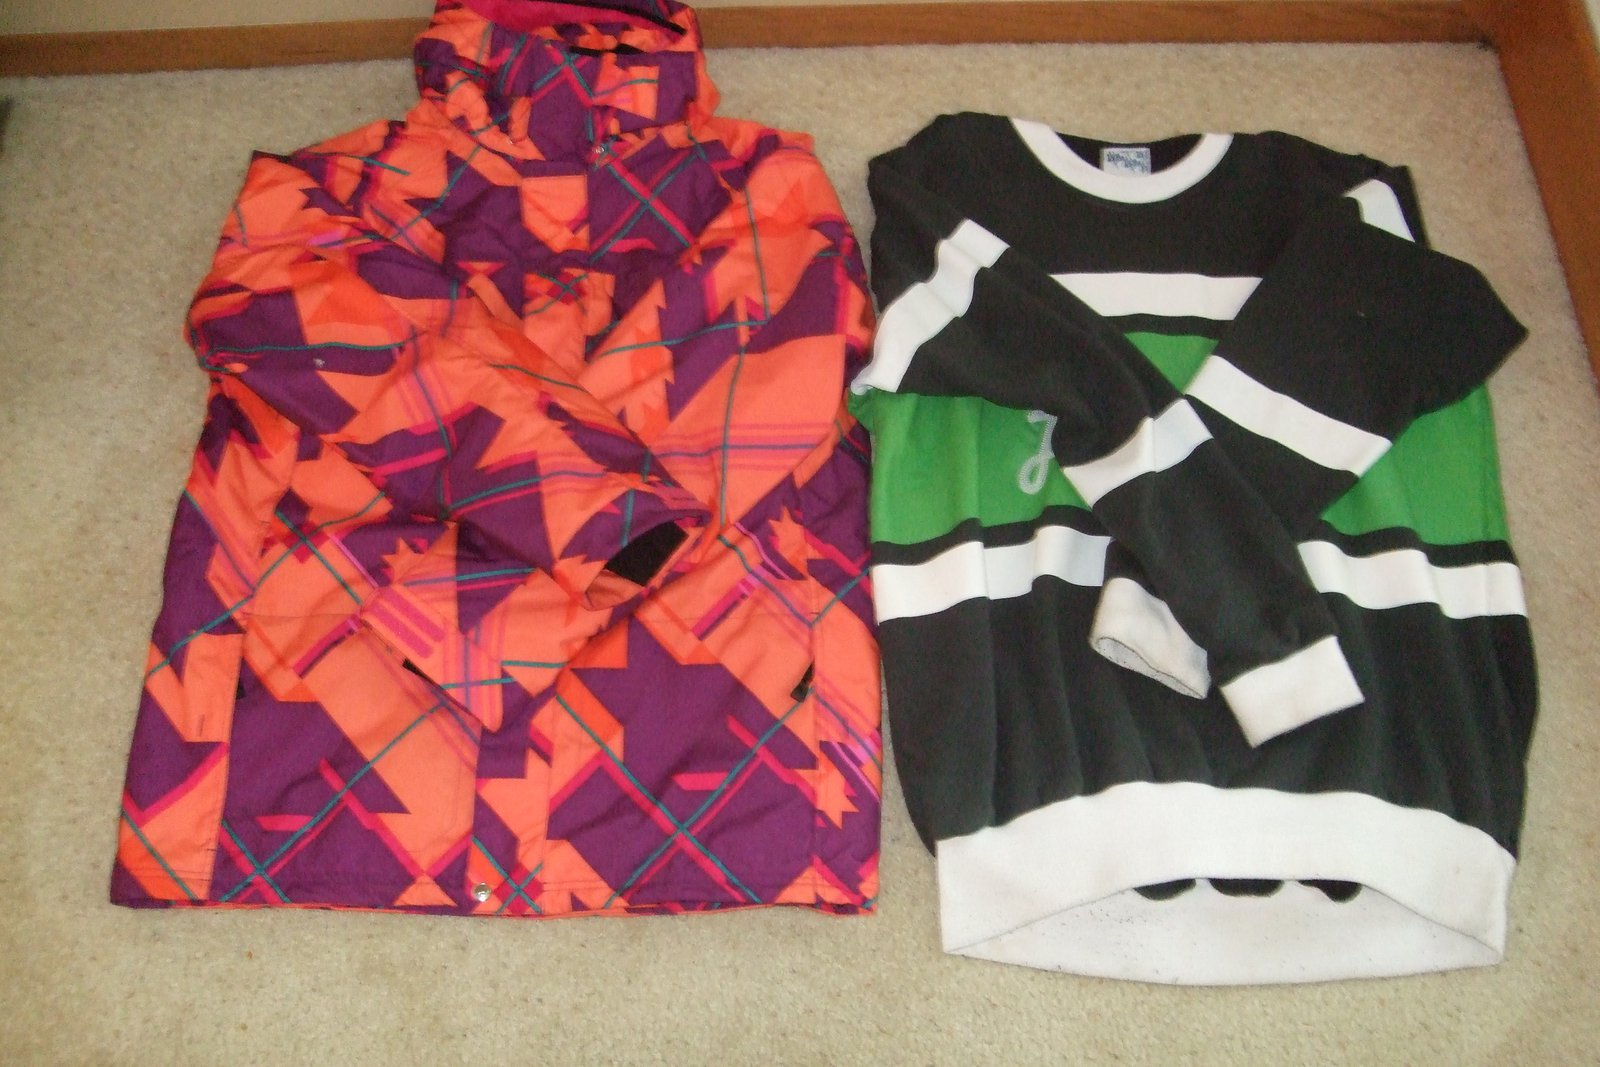 Bradford jacket xl / jiberish-level 1 crewneck xxl